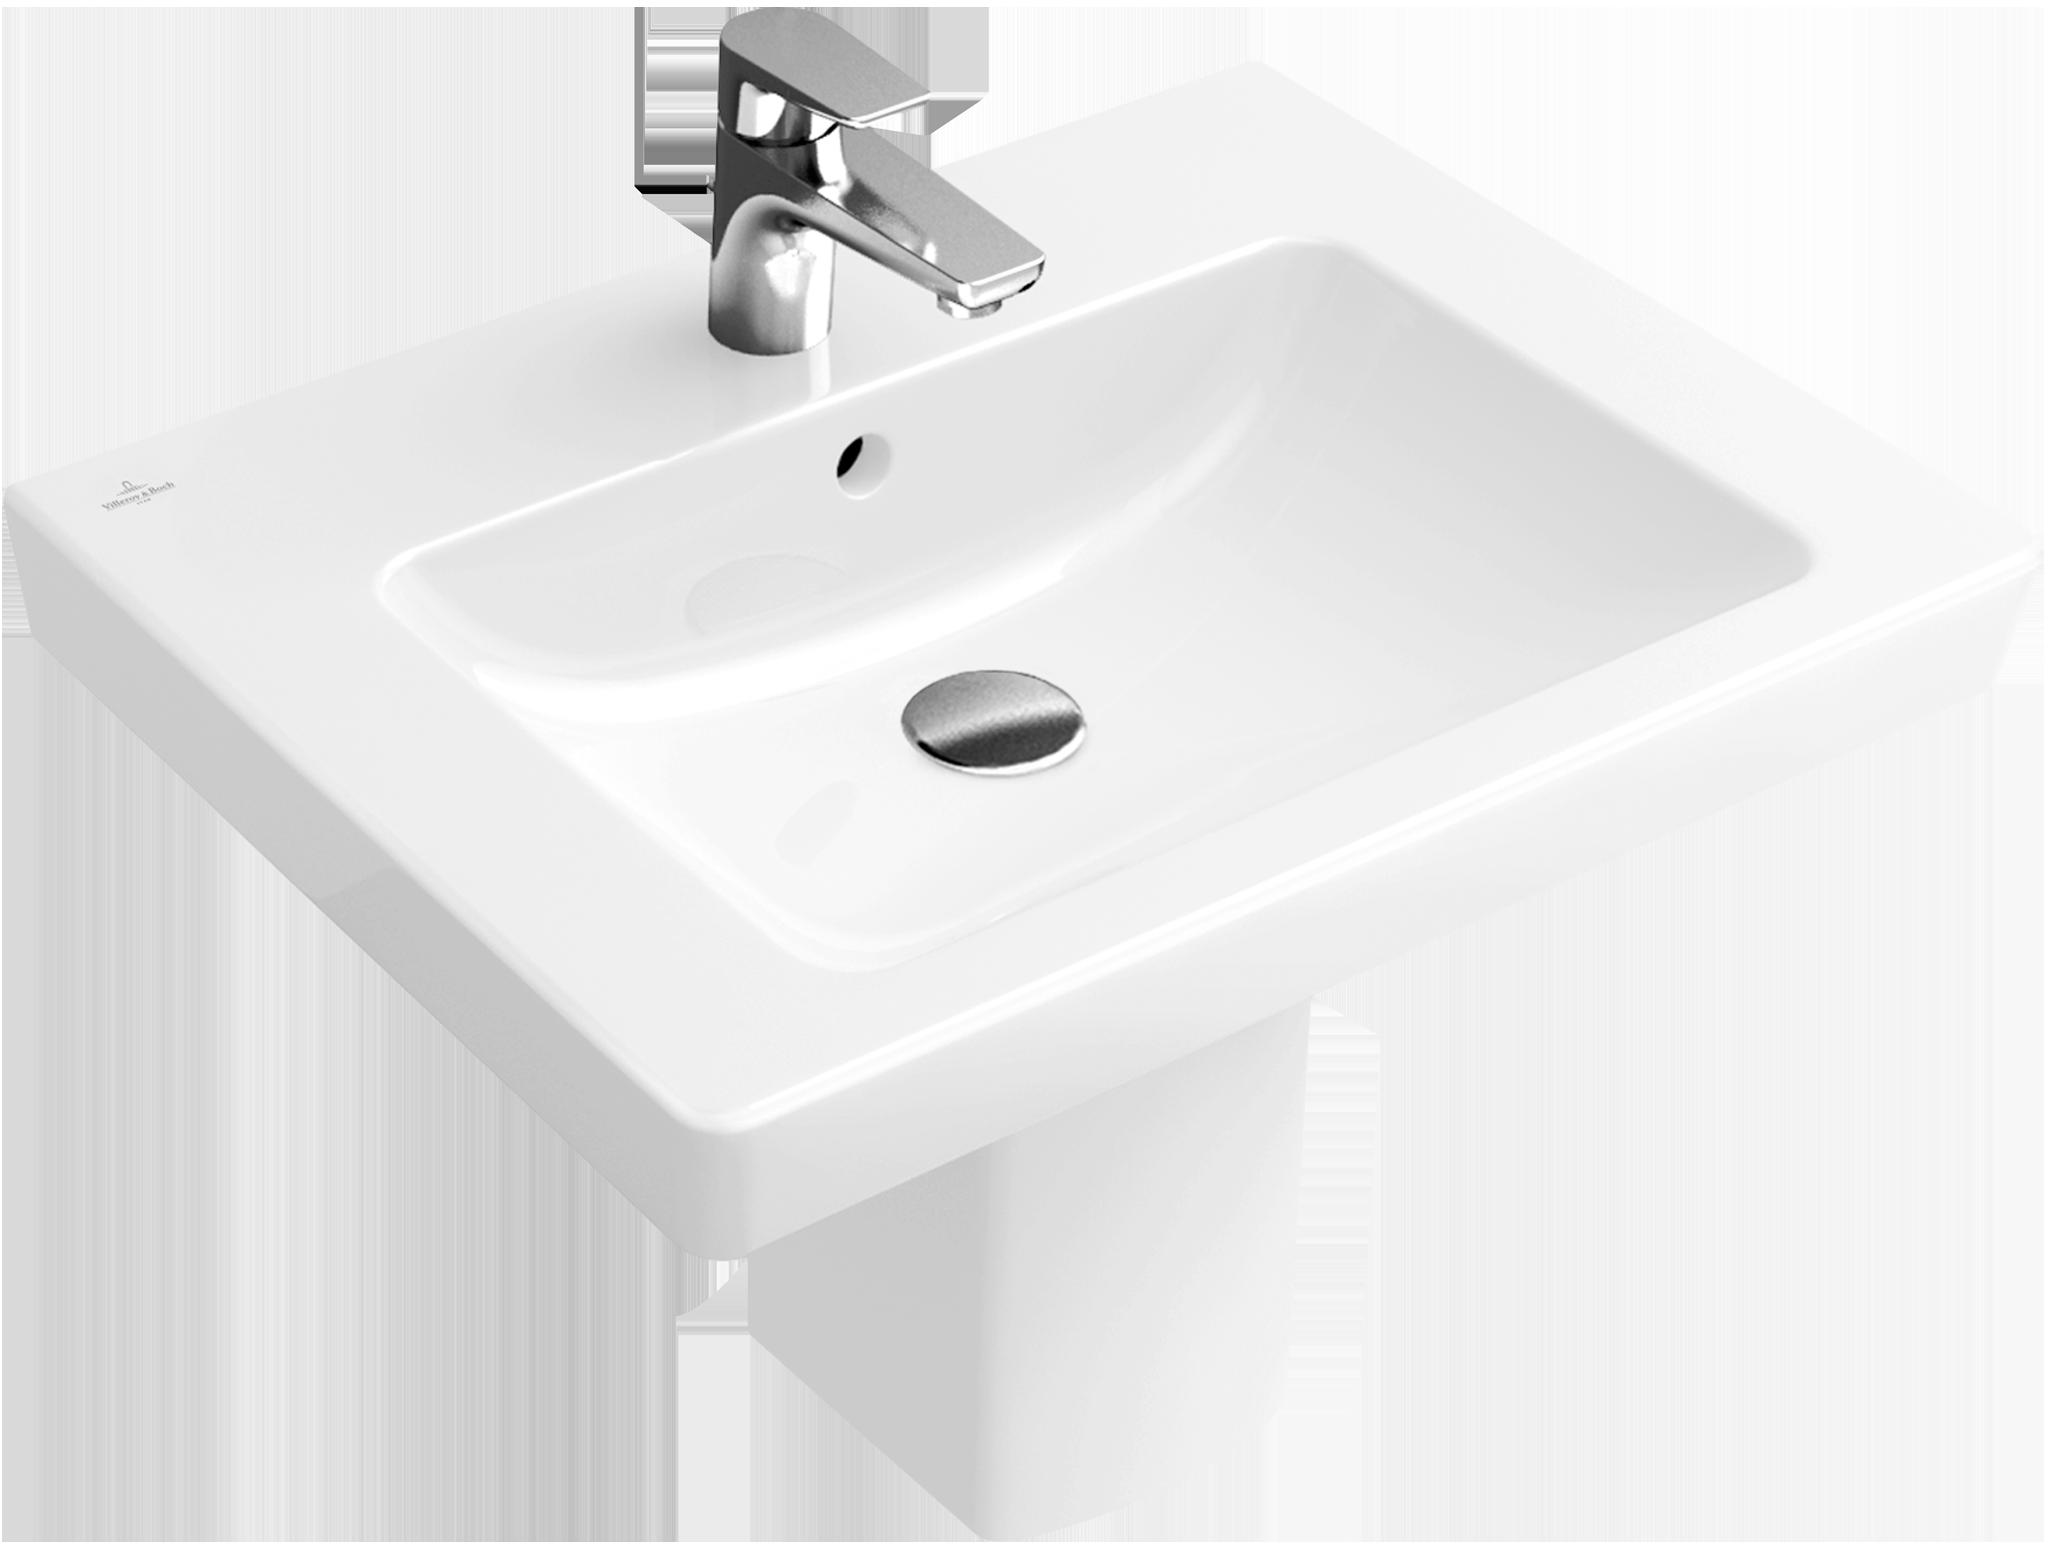 subway 2 0 washbasin angular 711360 villeroy boch. Black Bedroom Furniture Sets. Home Design Ideas